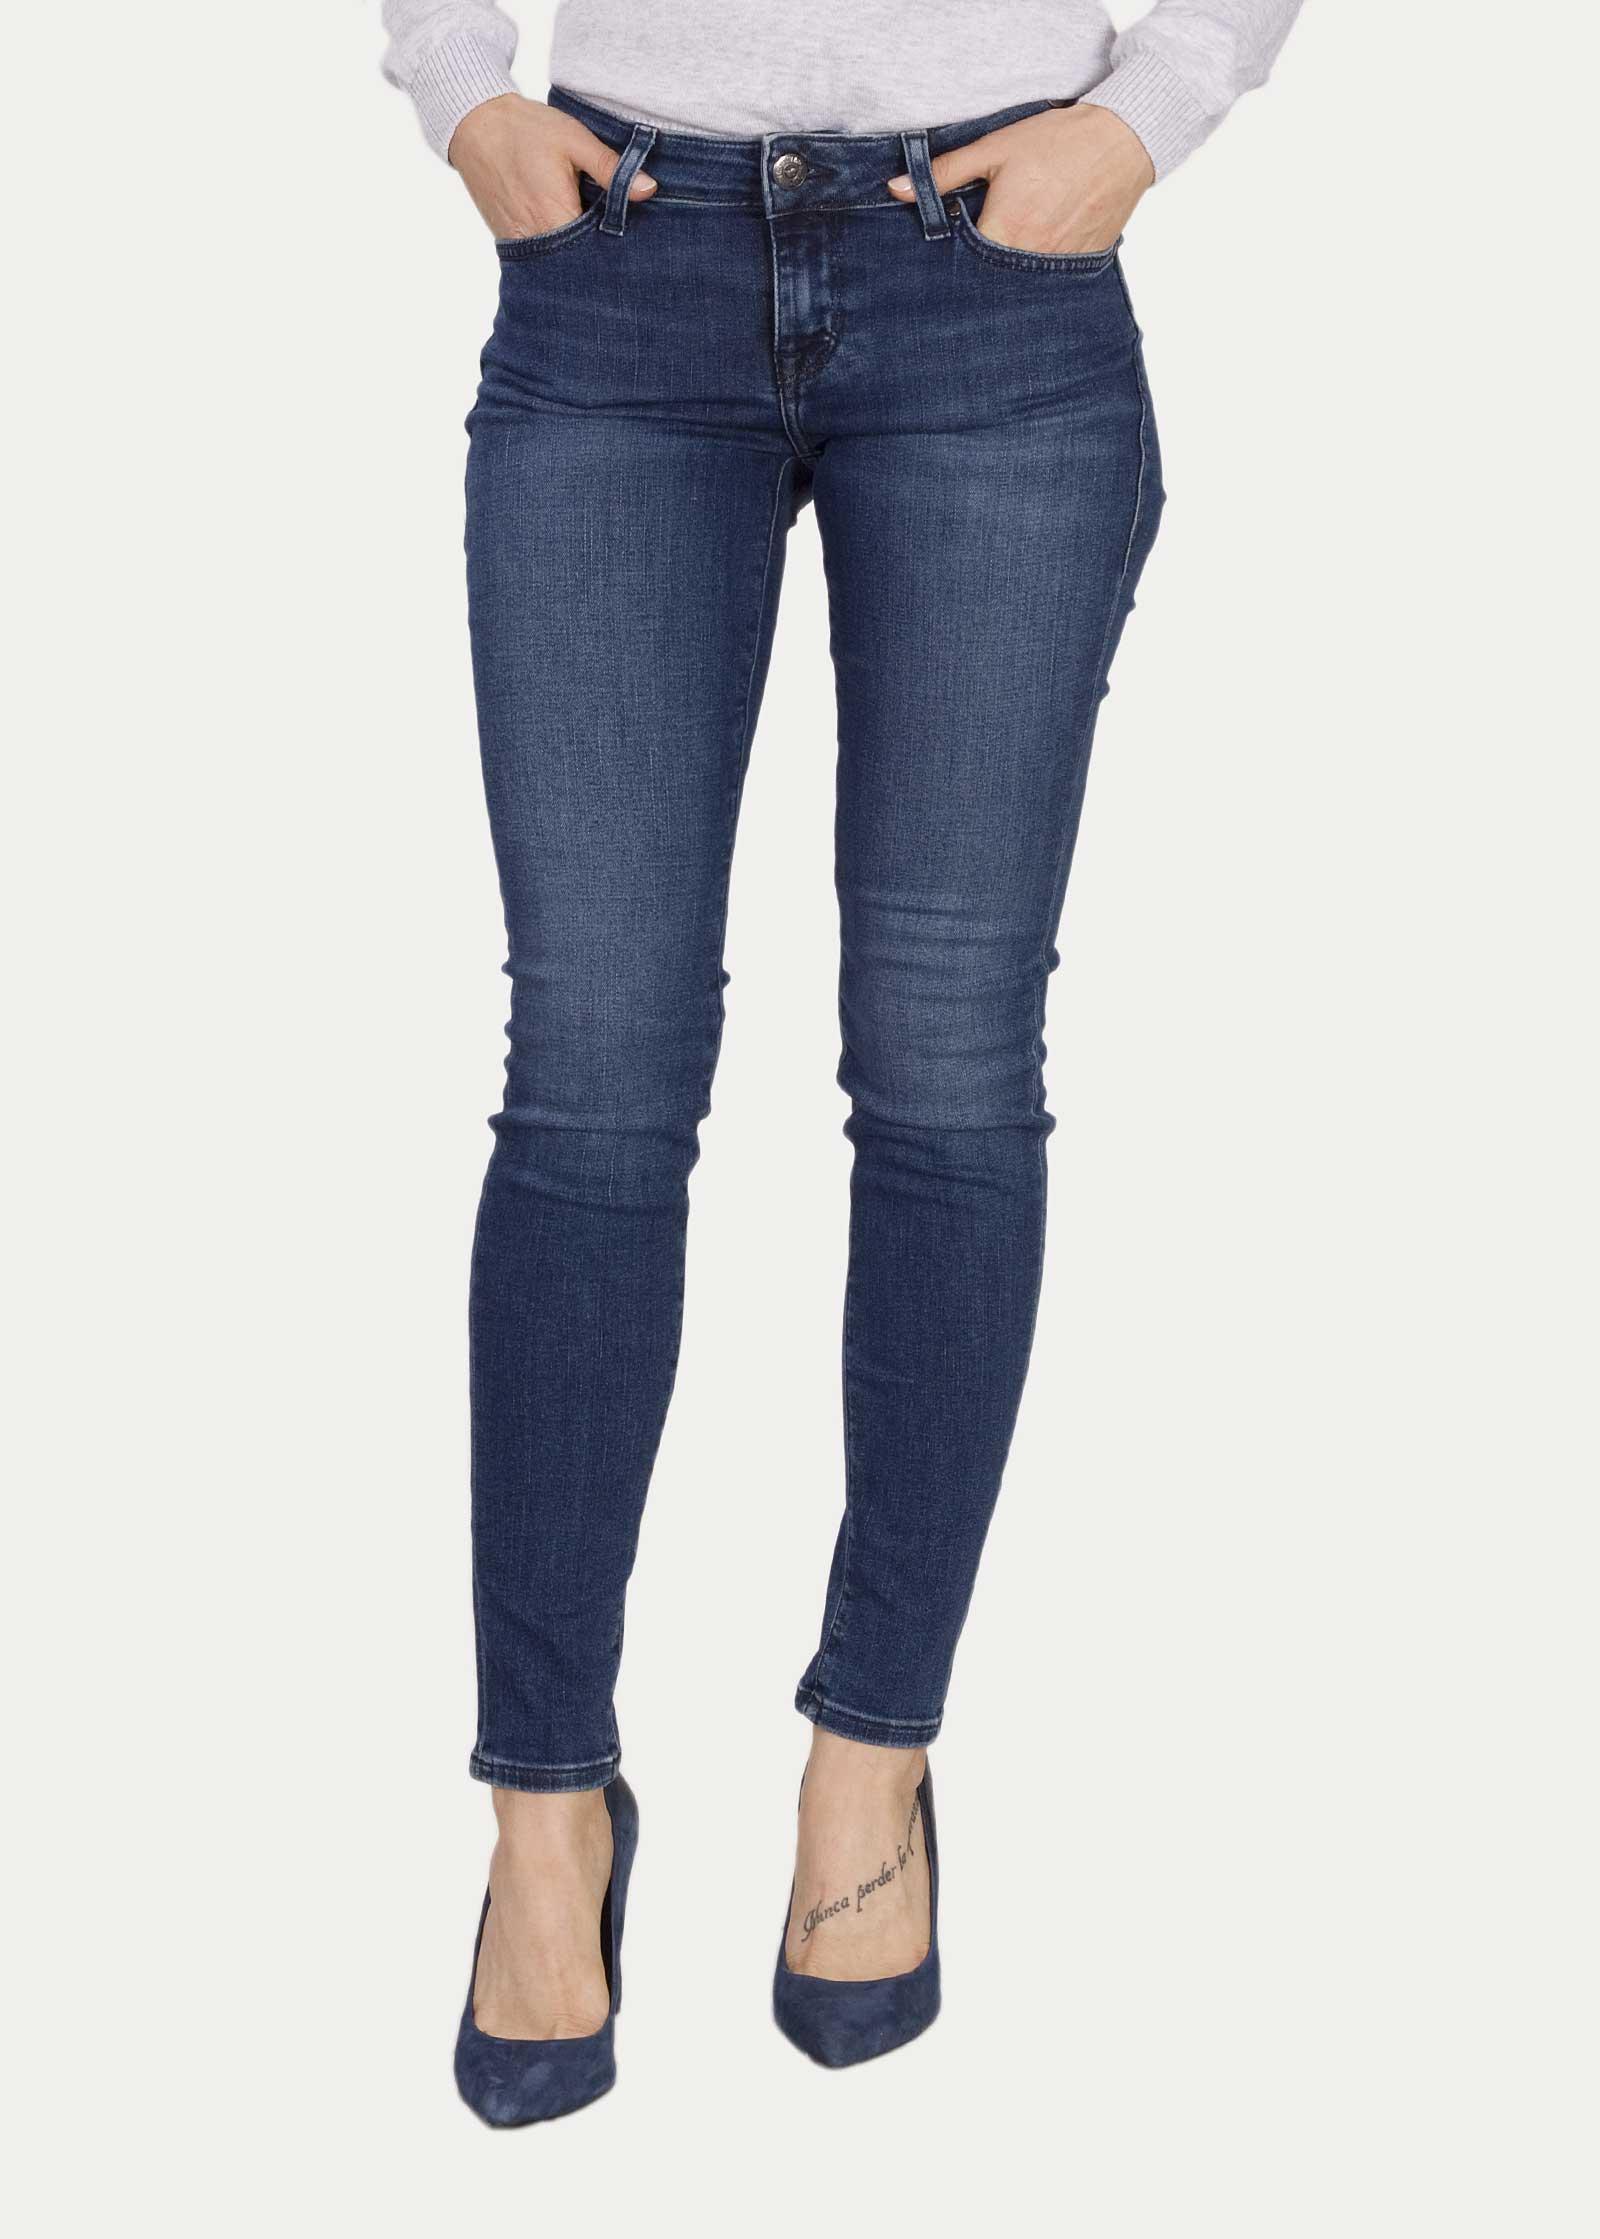 Womans Jeans Mustang Jasmin Jeggins - 502 Medium Middle